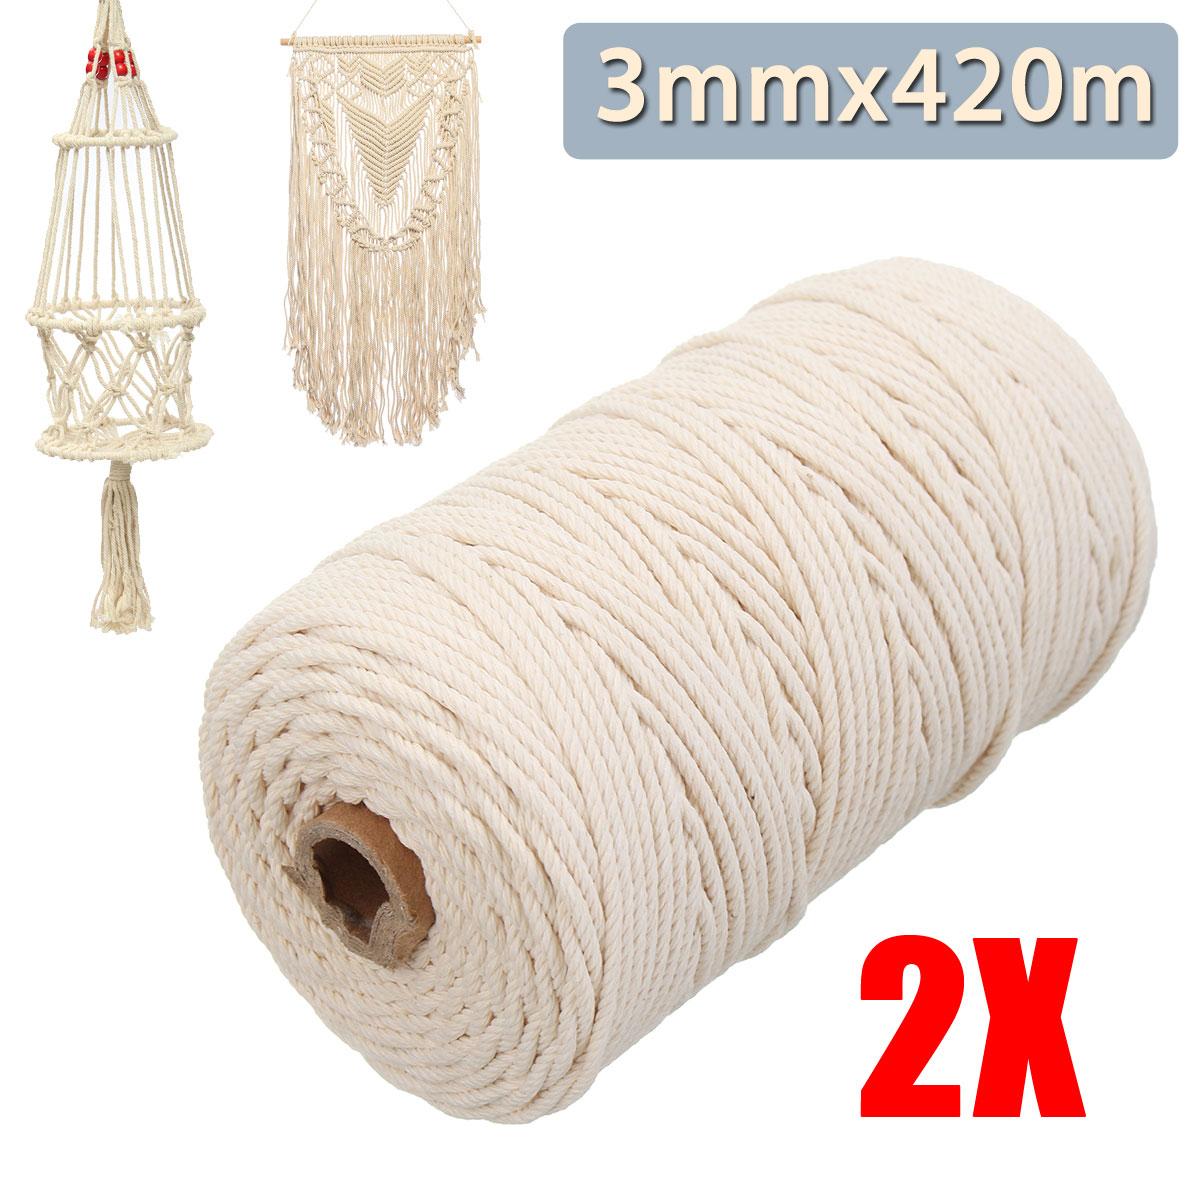 3mmx420m beige naturel macram fil coton corde torsad e. Black Bedroom Furniture Sets. Home Design Ideas